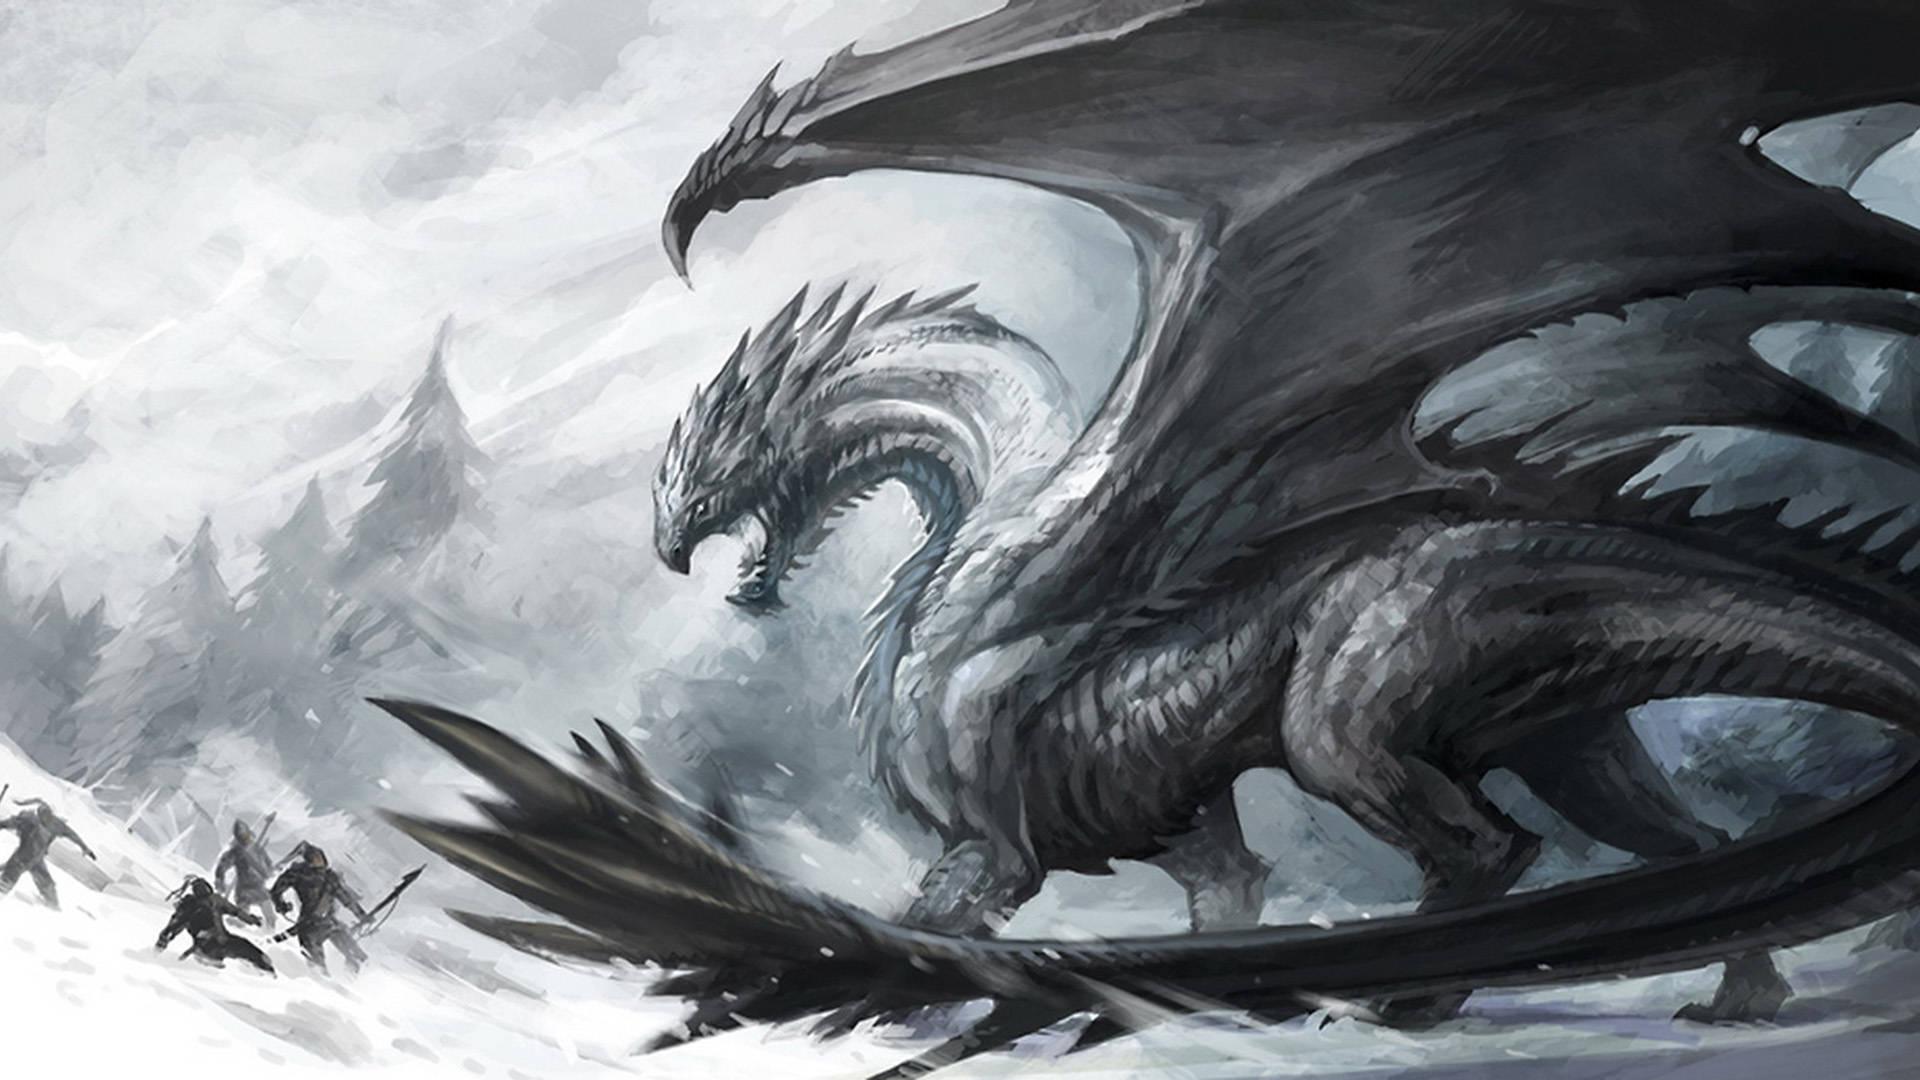 Download Ice Dragon Art Wallpaper Wallpapers 1920x1080